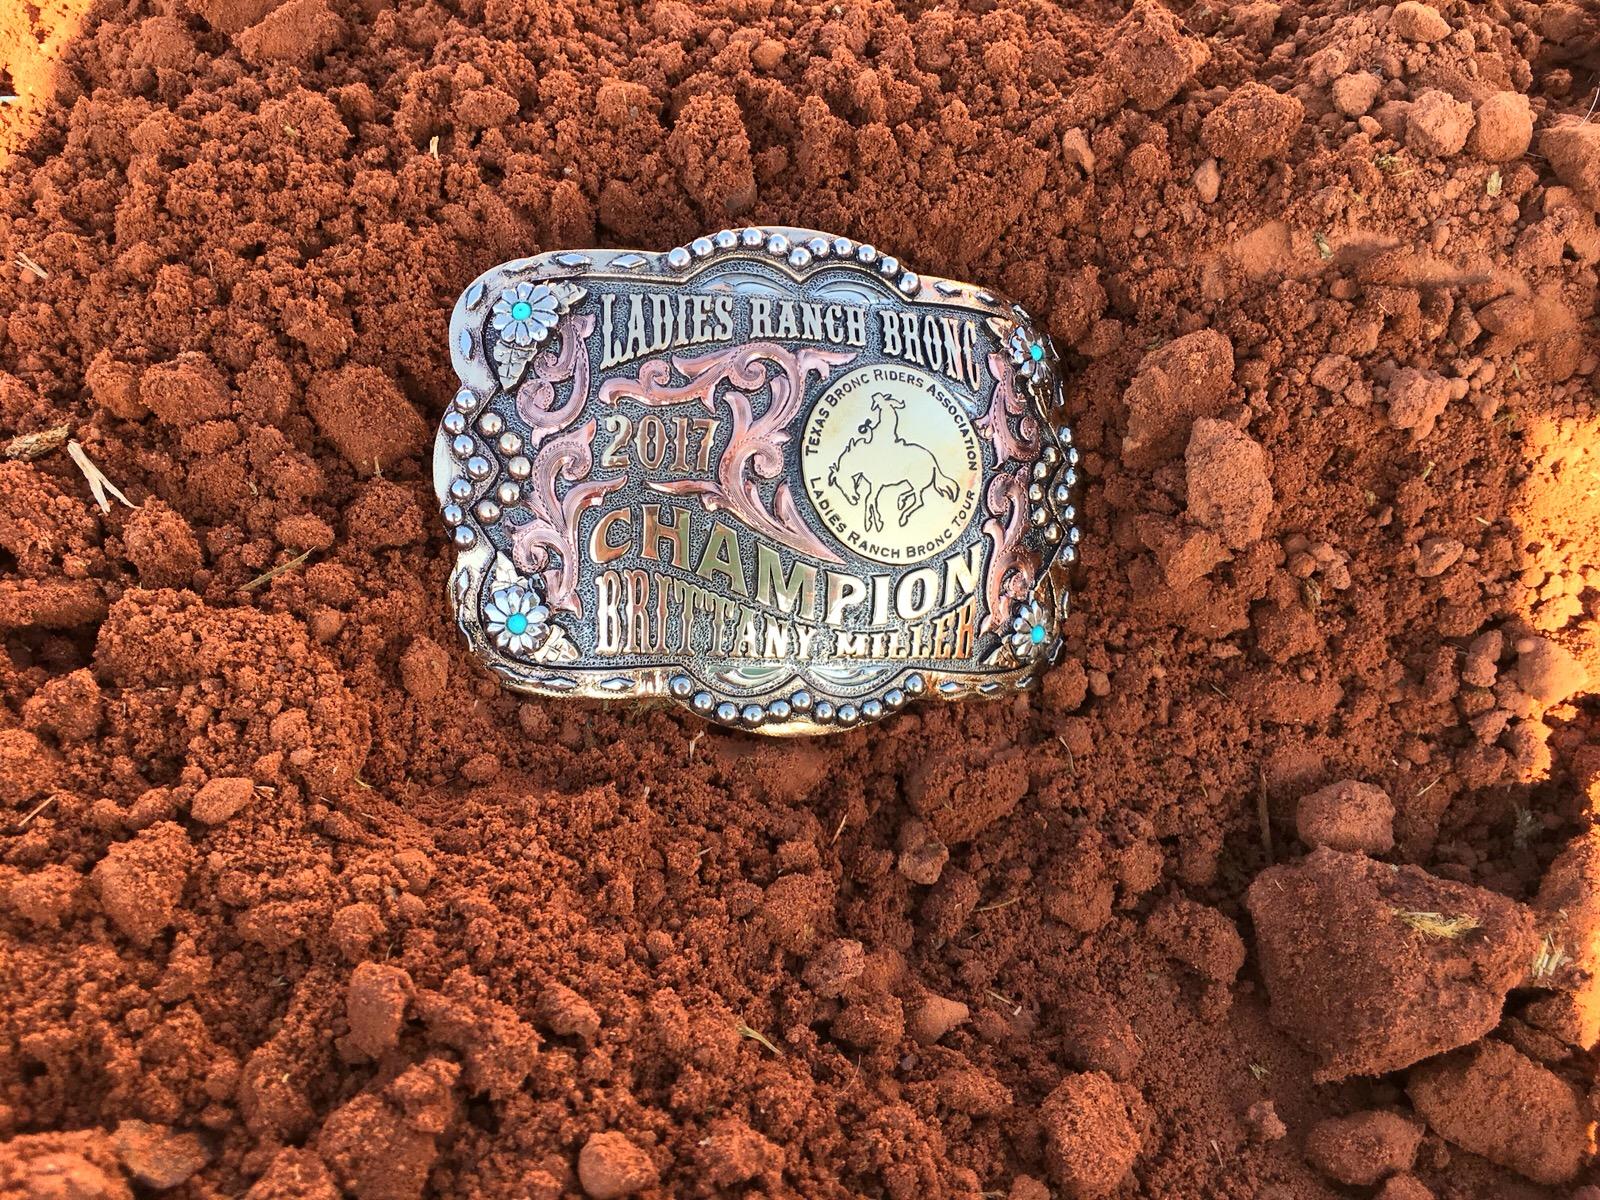 2017 Ladies Ranch Bronc Champion, Brittany Miller